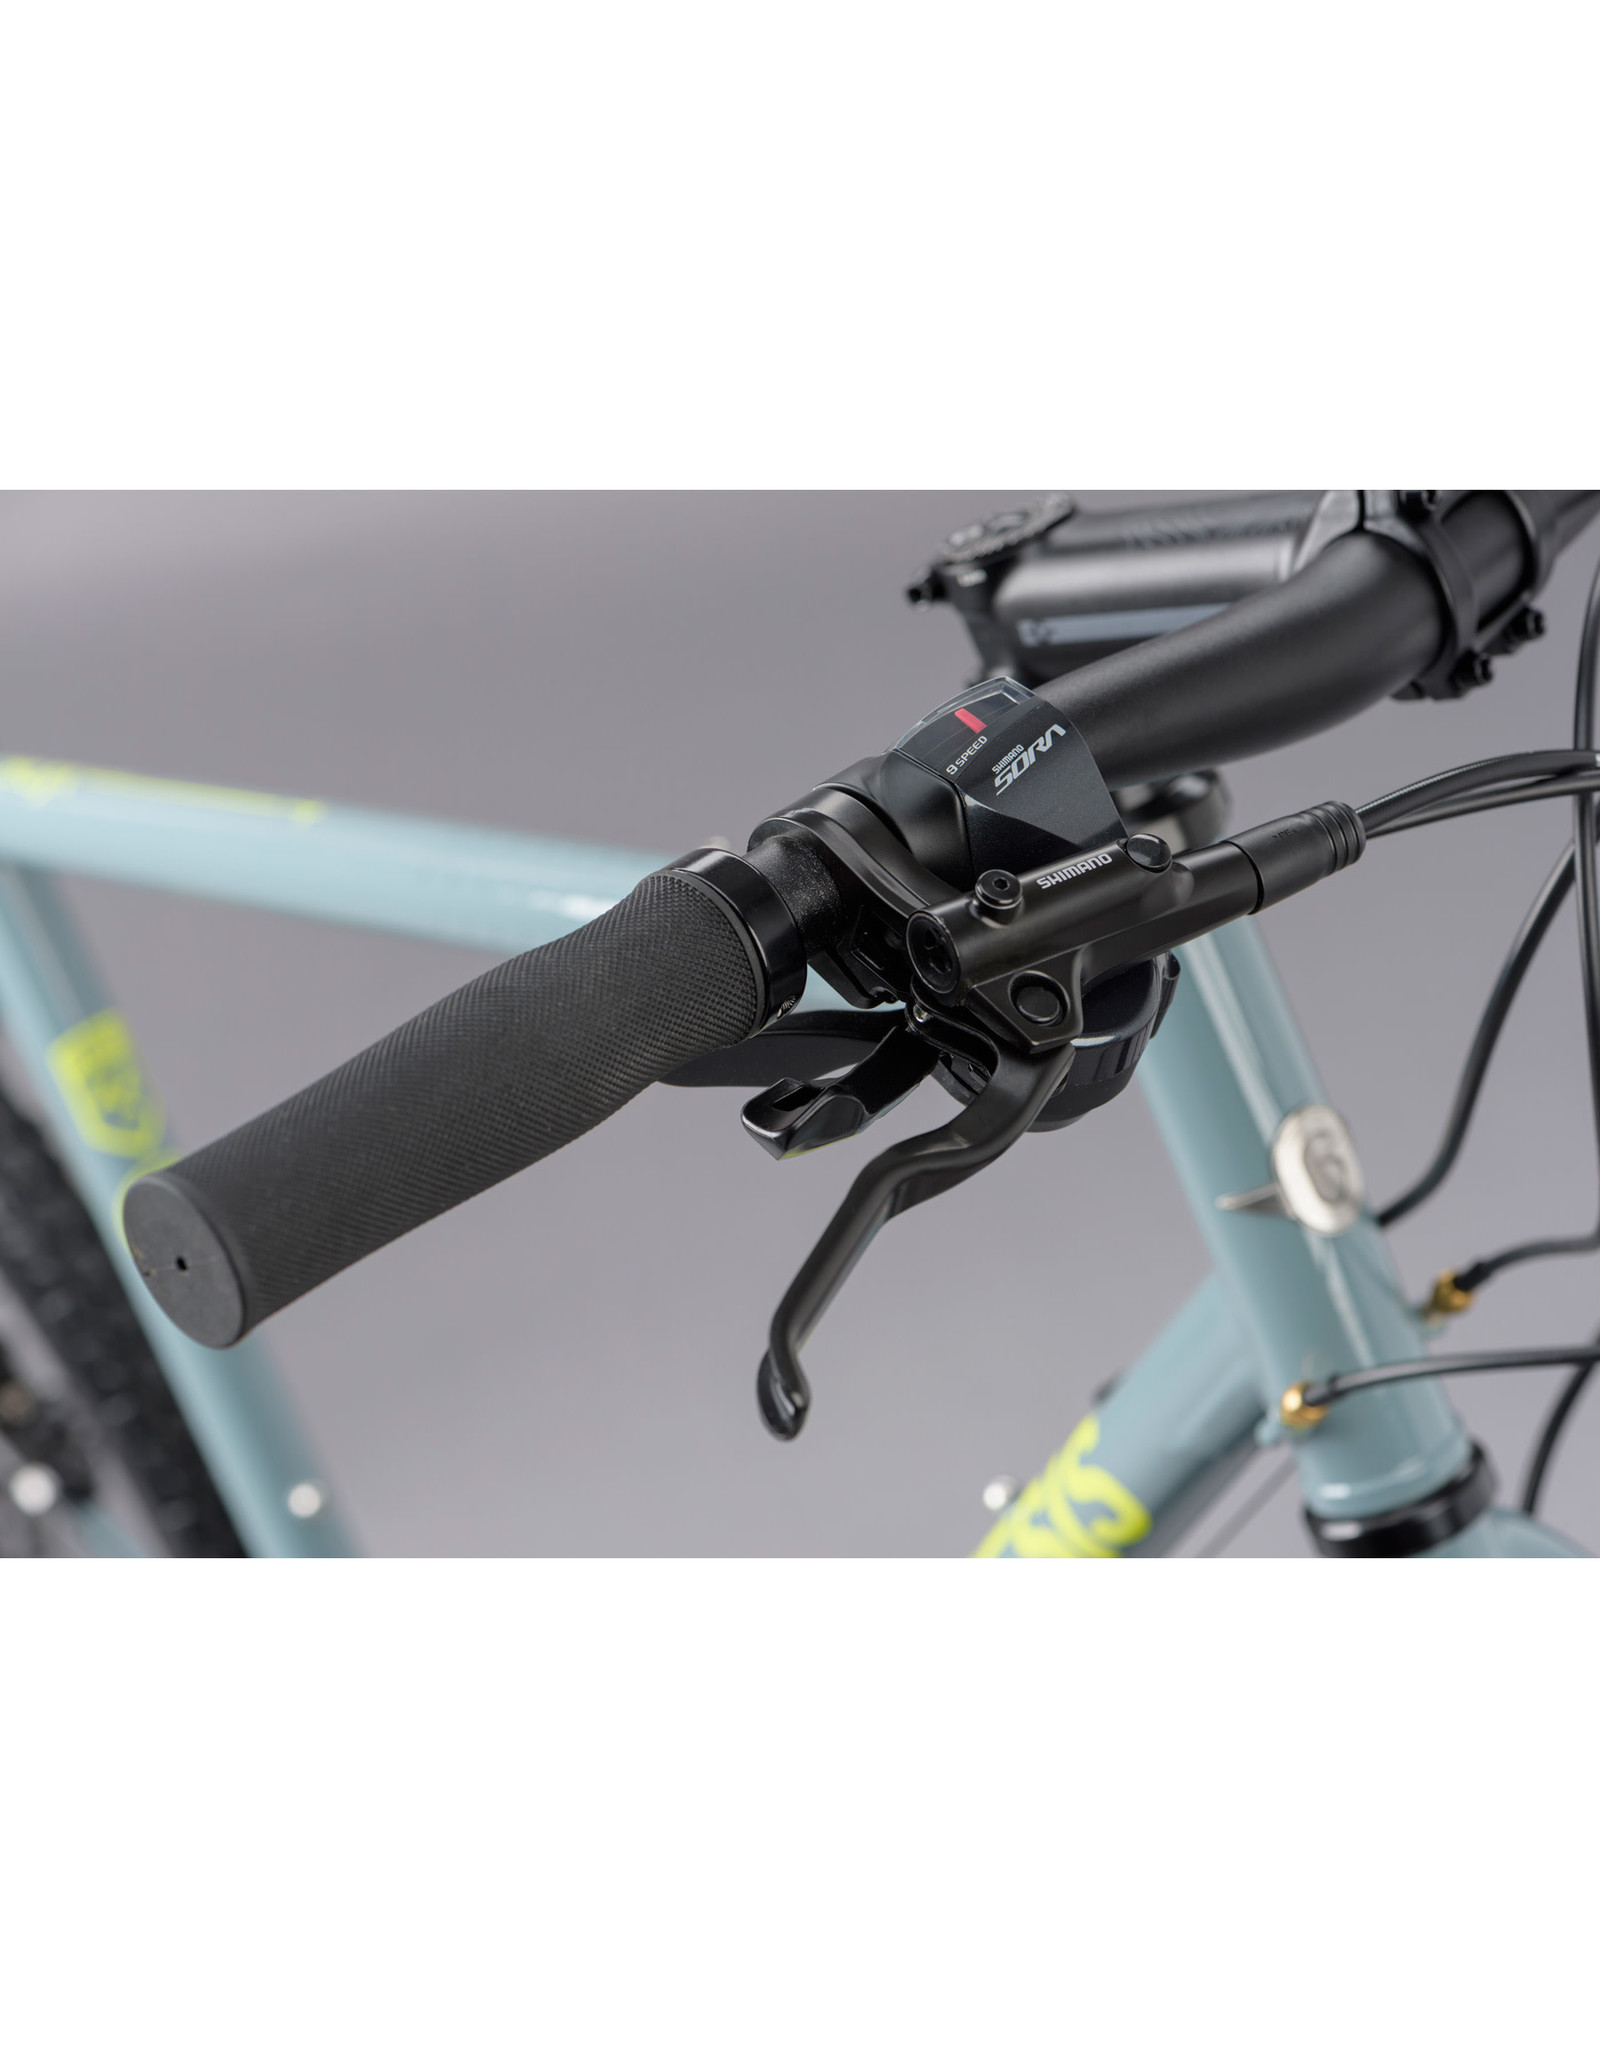 Genesis Croix De Fer 10 Flat Bar Adventure Bike 2021